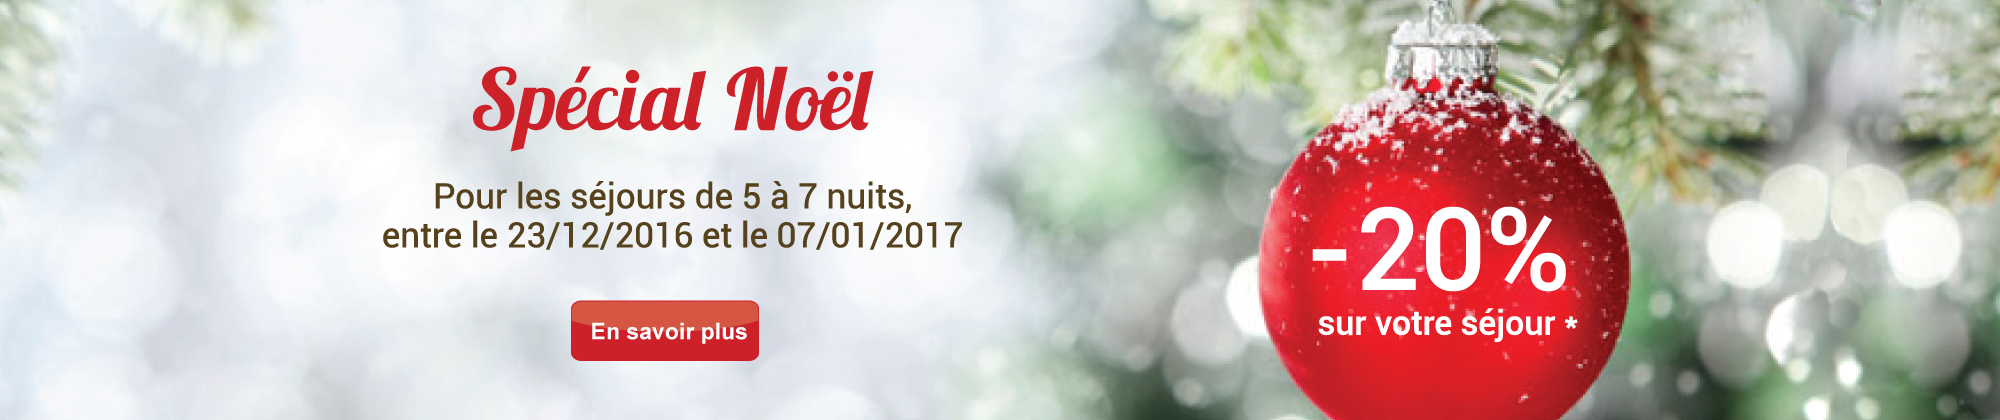 offre-speciale-noel